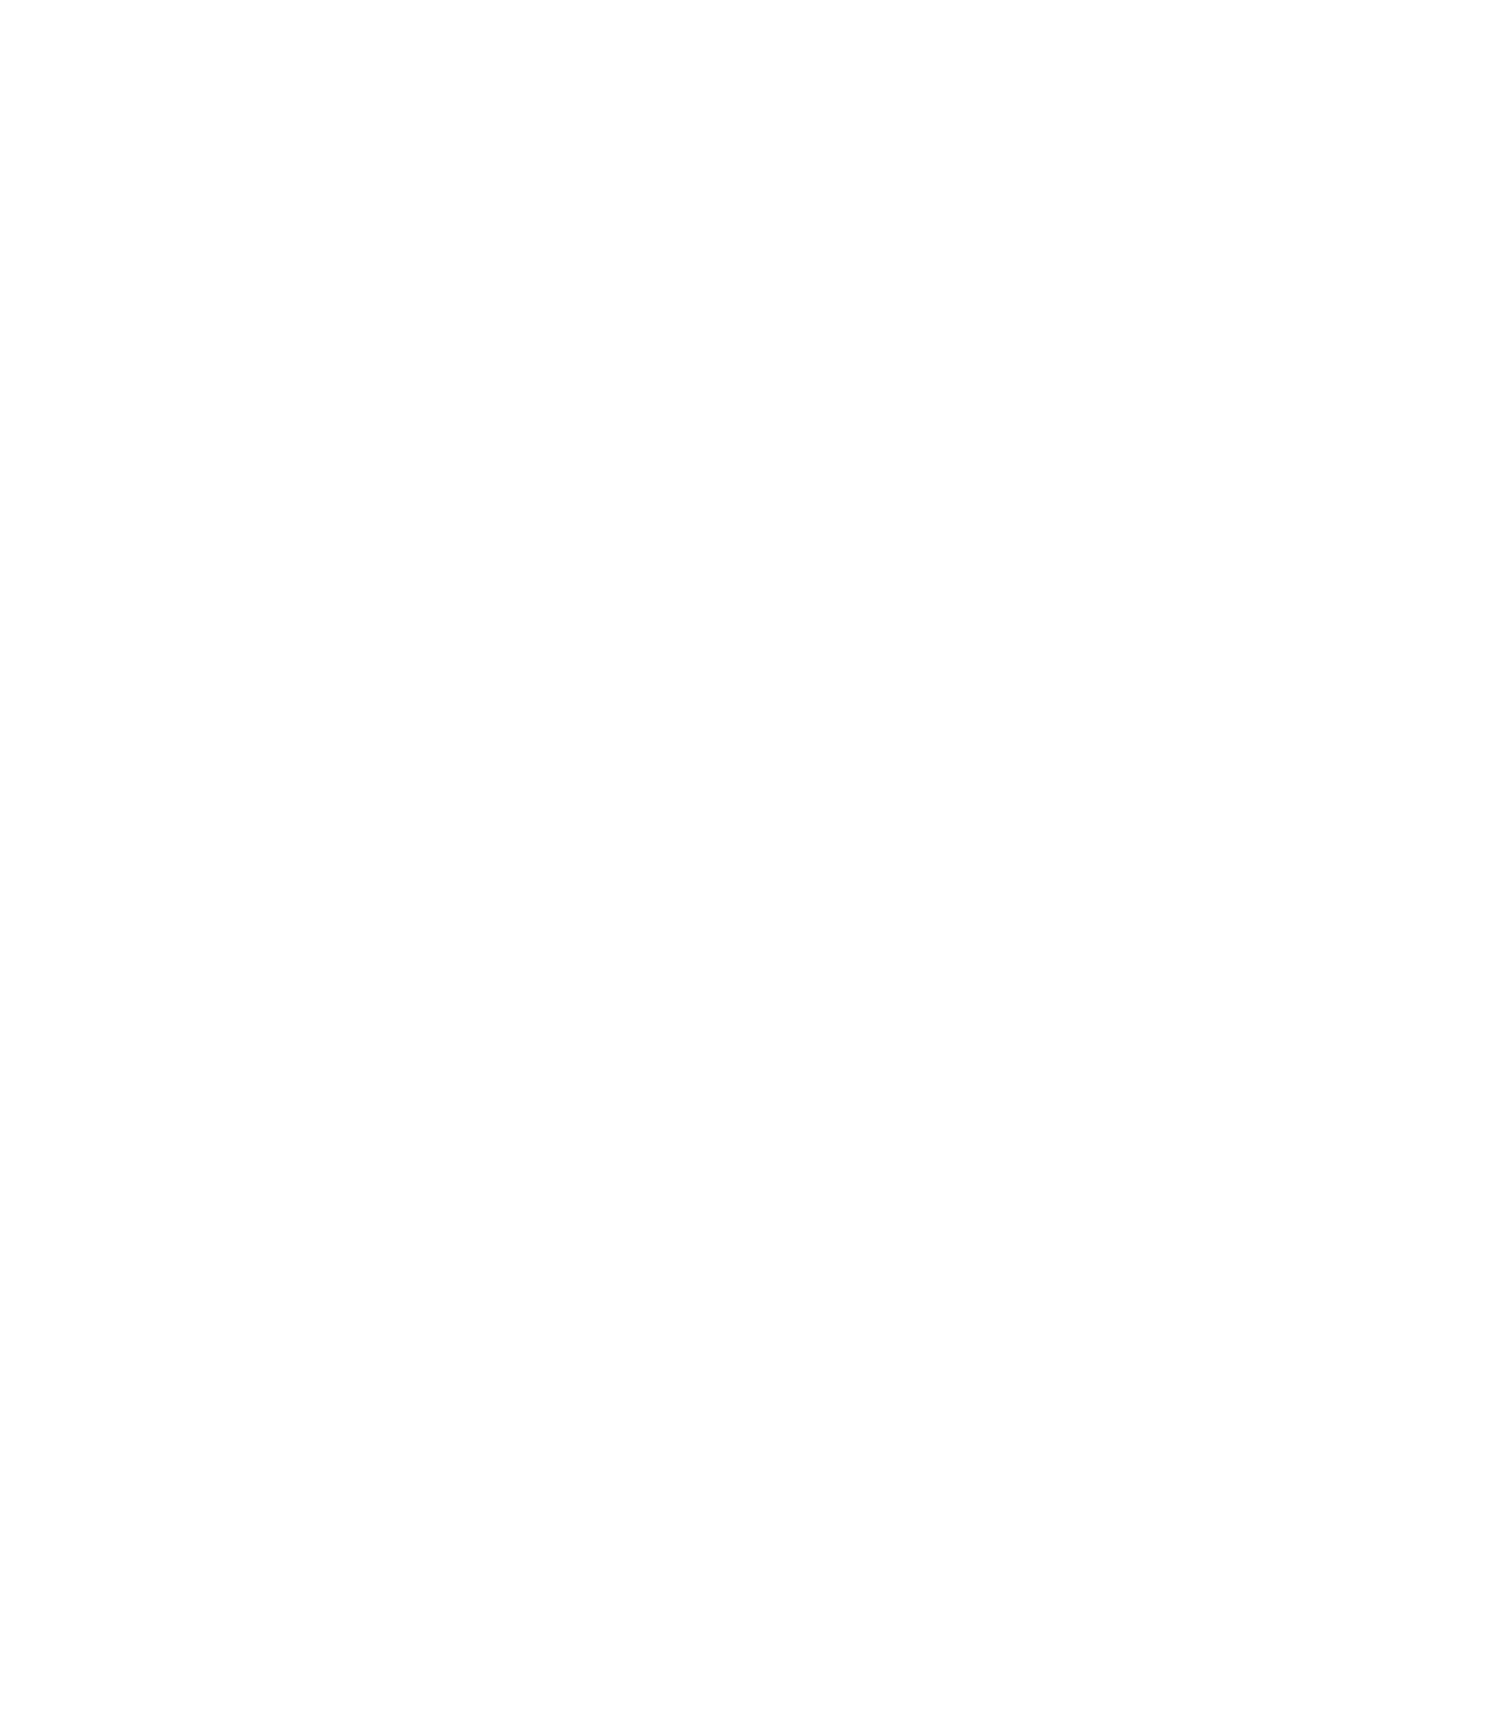 Creative Cabal